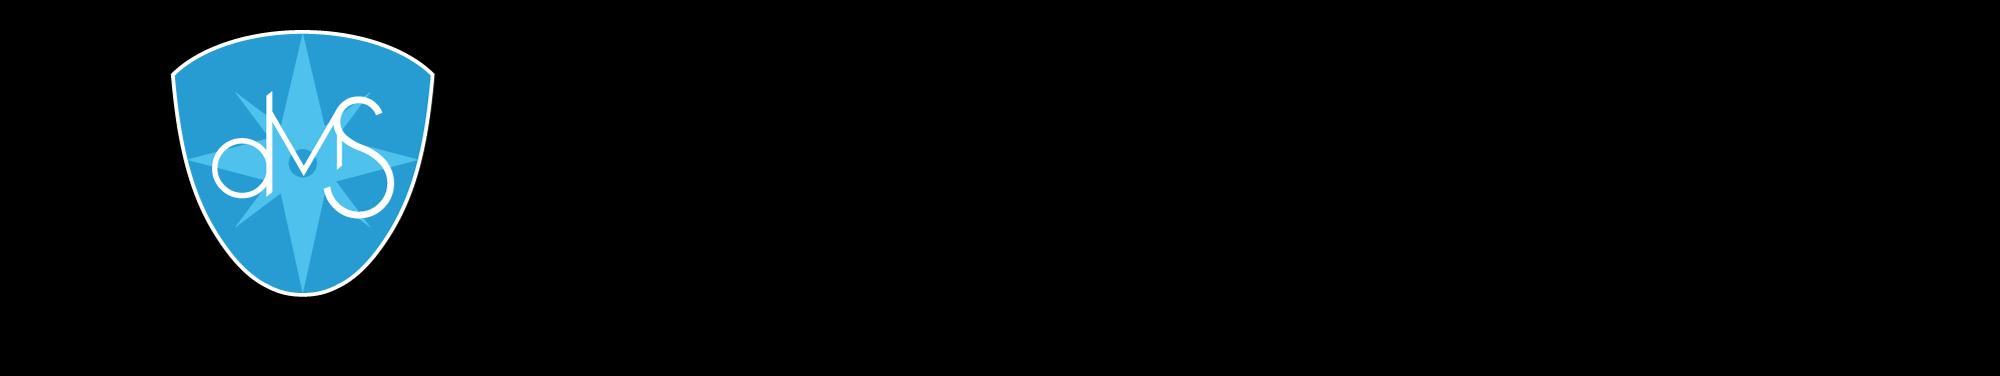 DMS Holland logo